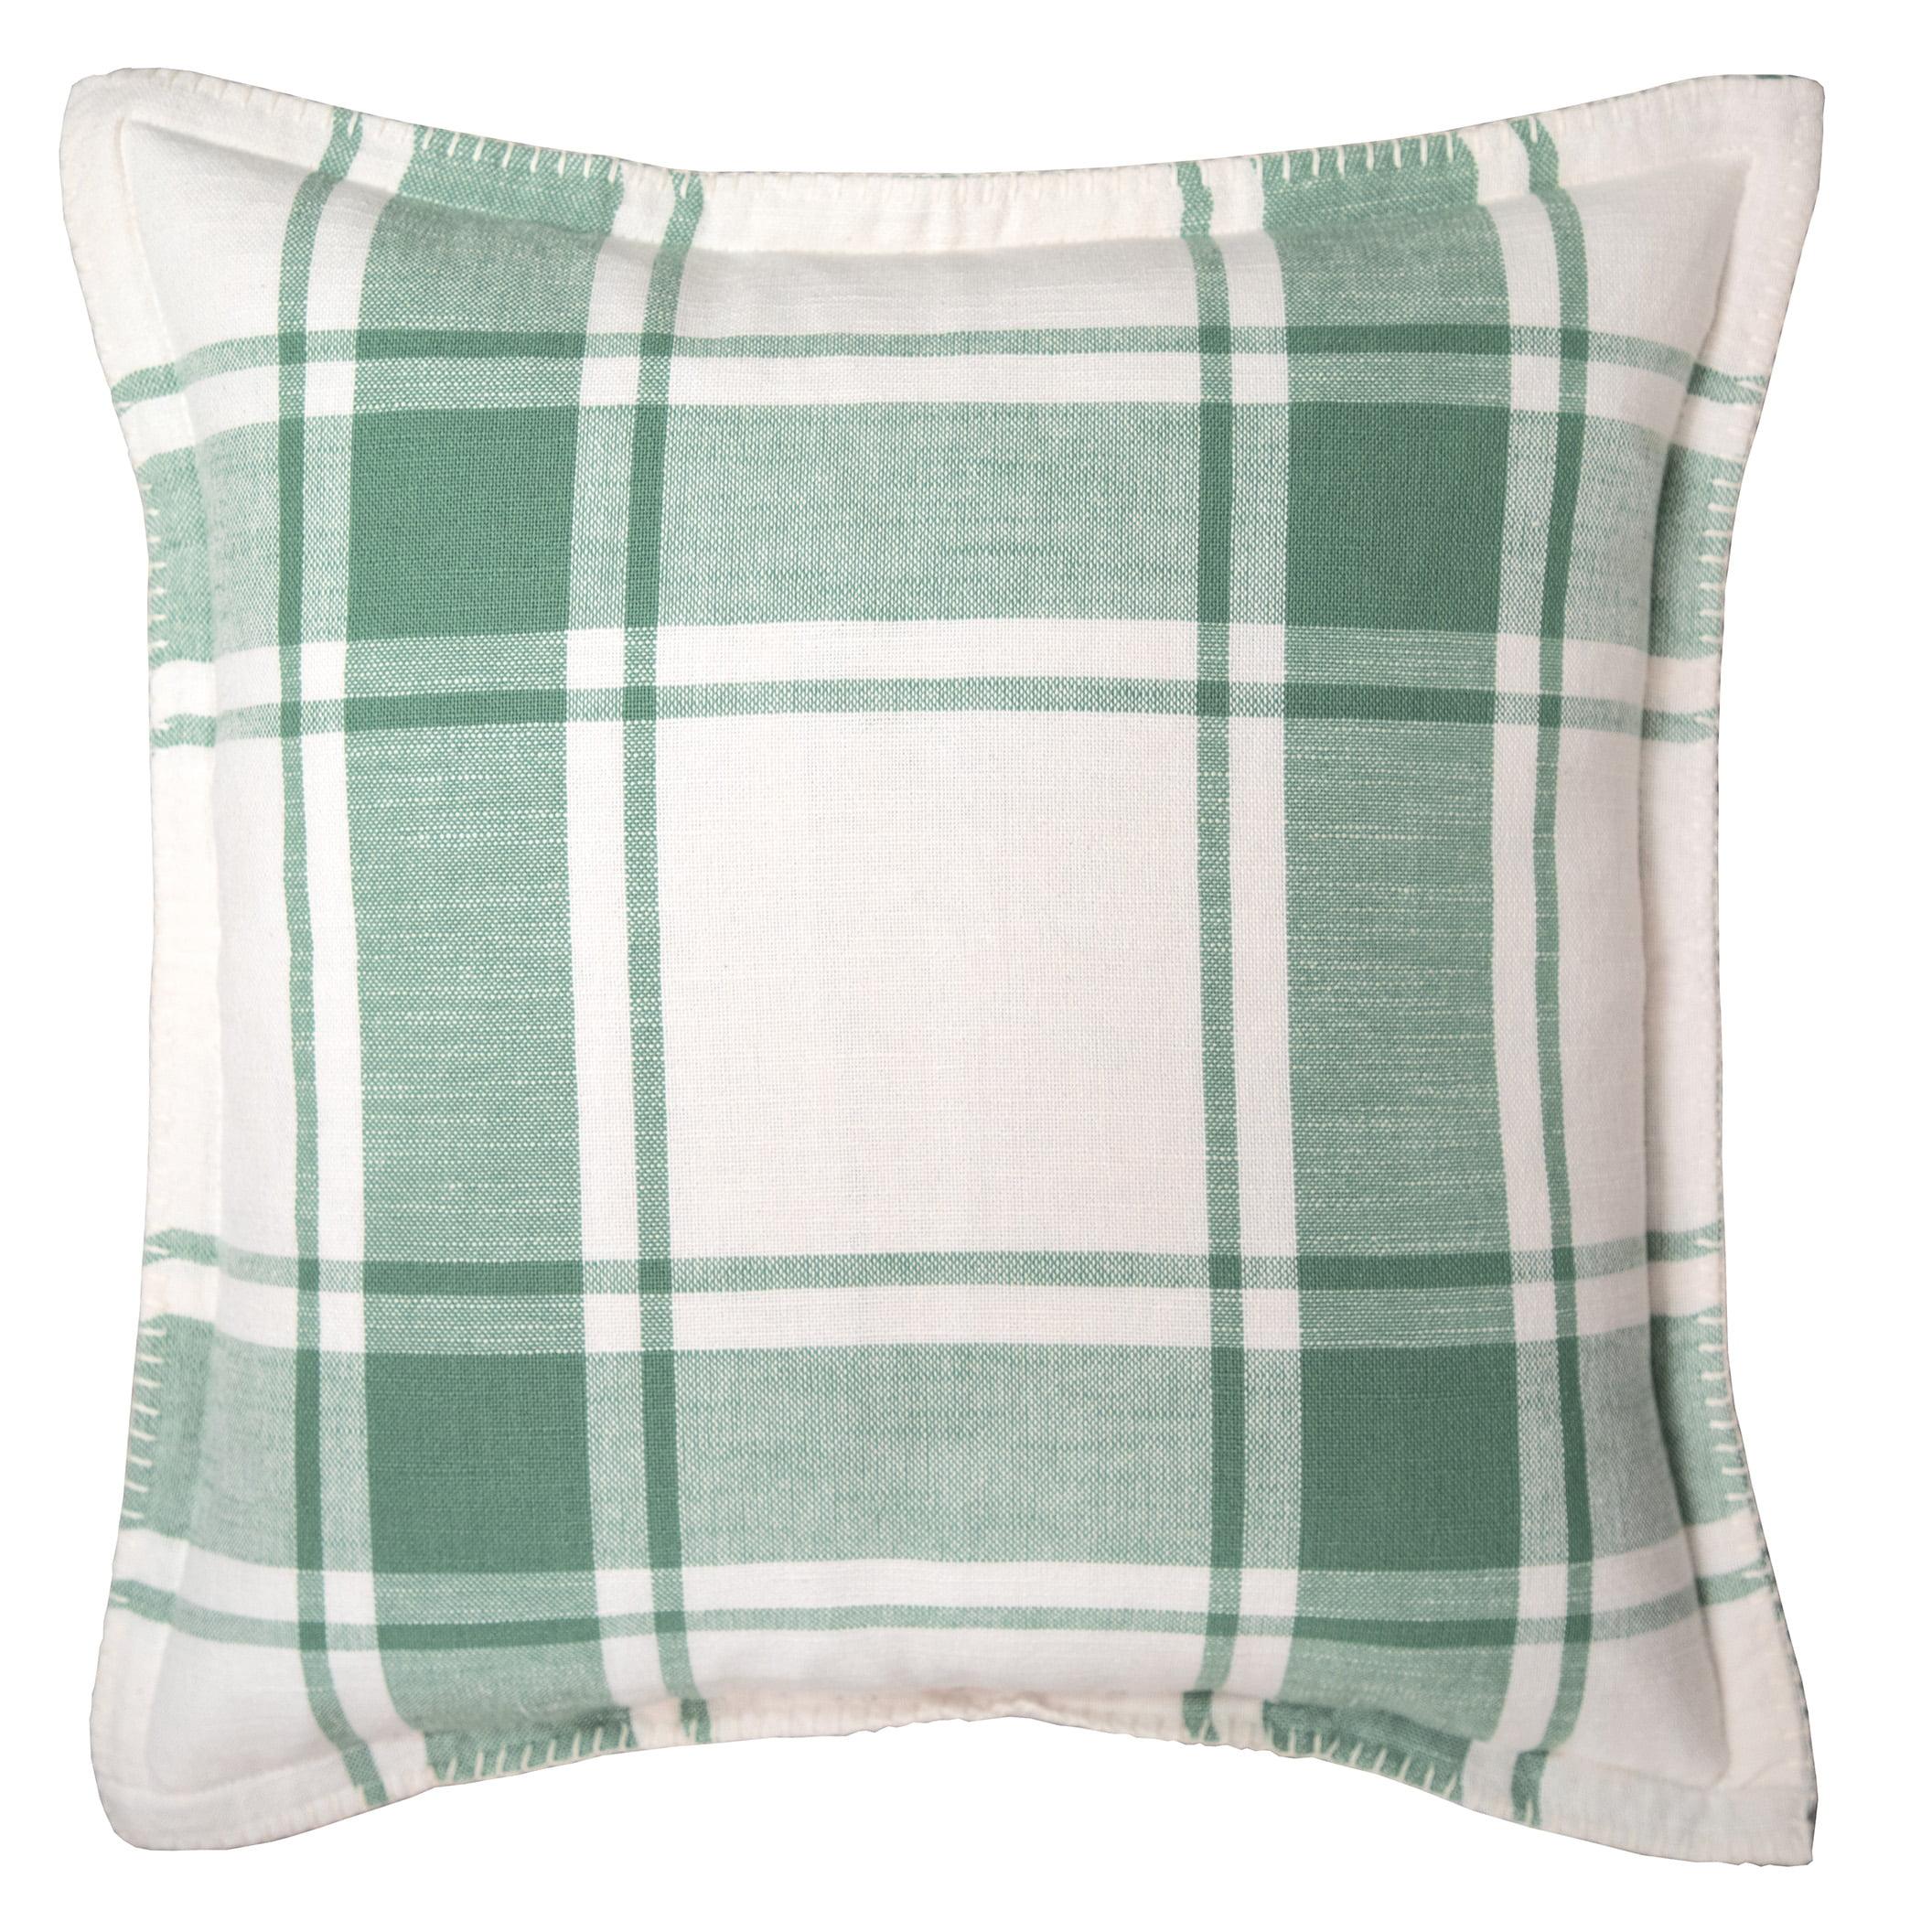 better homes gardens reversible plaid decorative pillow 20 x 20 green sage